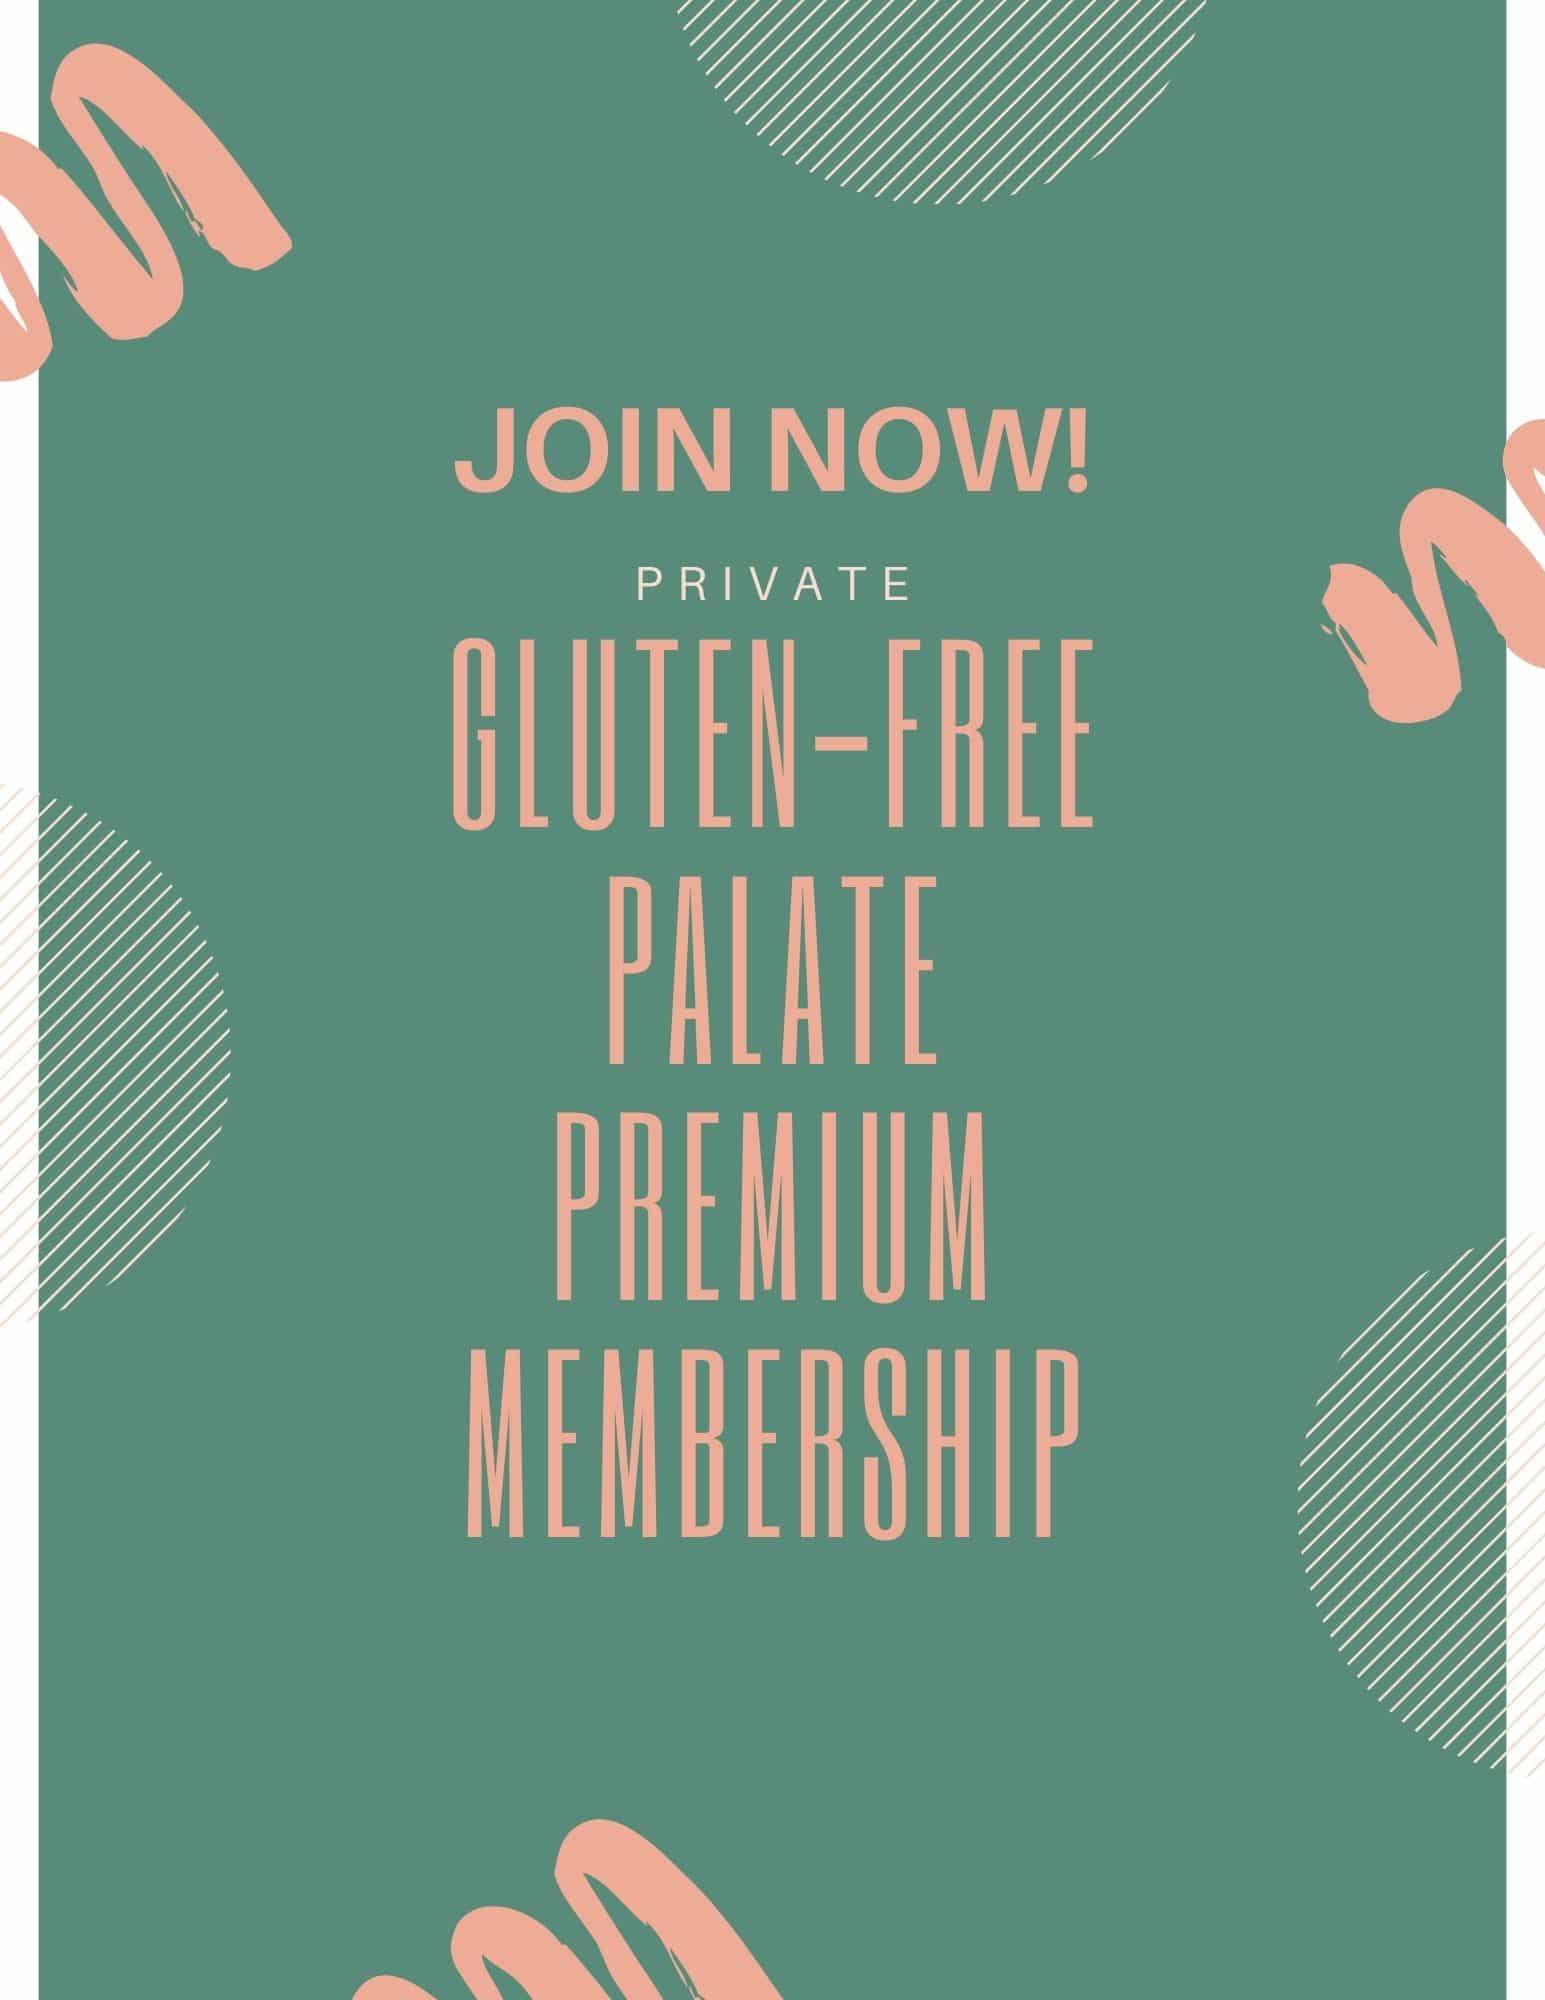 Button to join gluten free palate premium membership program